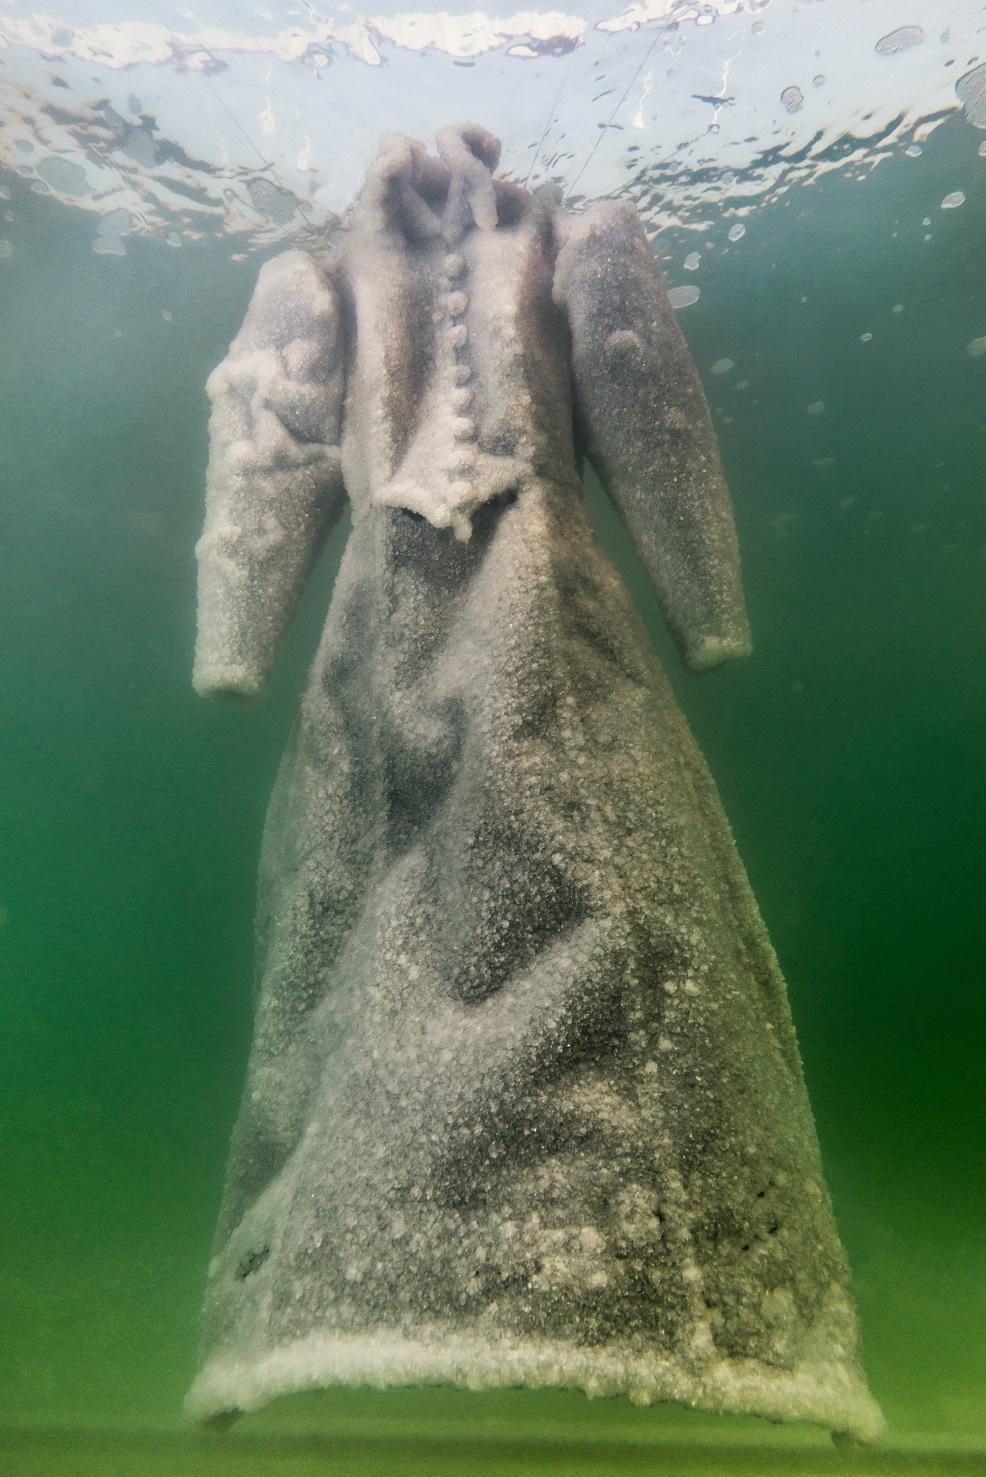 Sigalit Landau, Salt Crystal Bridal Gown